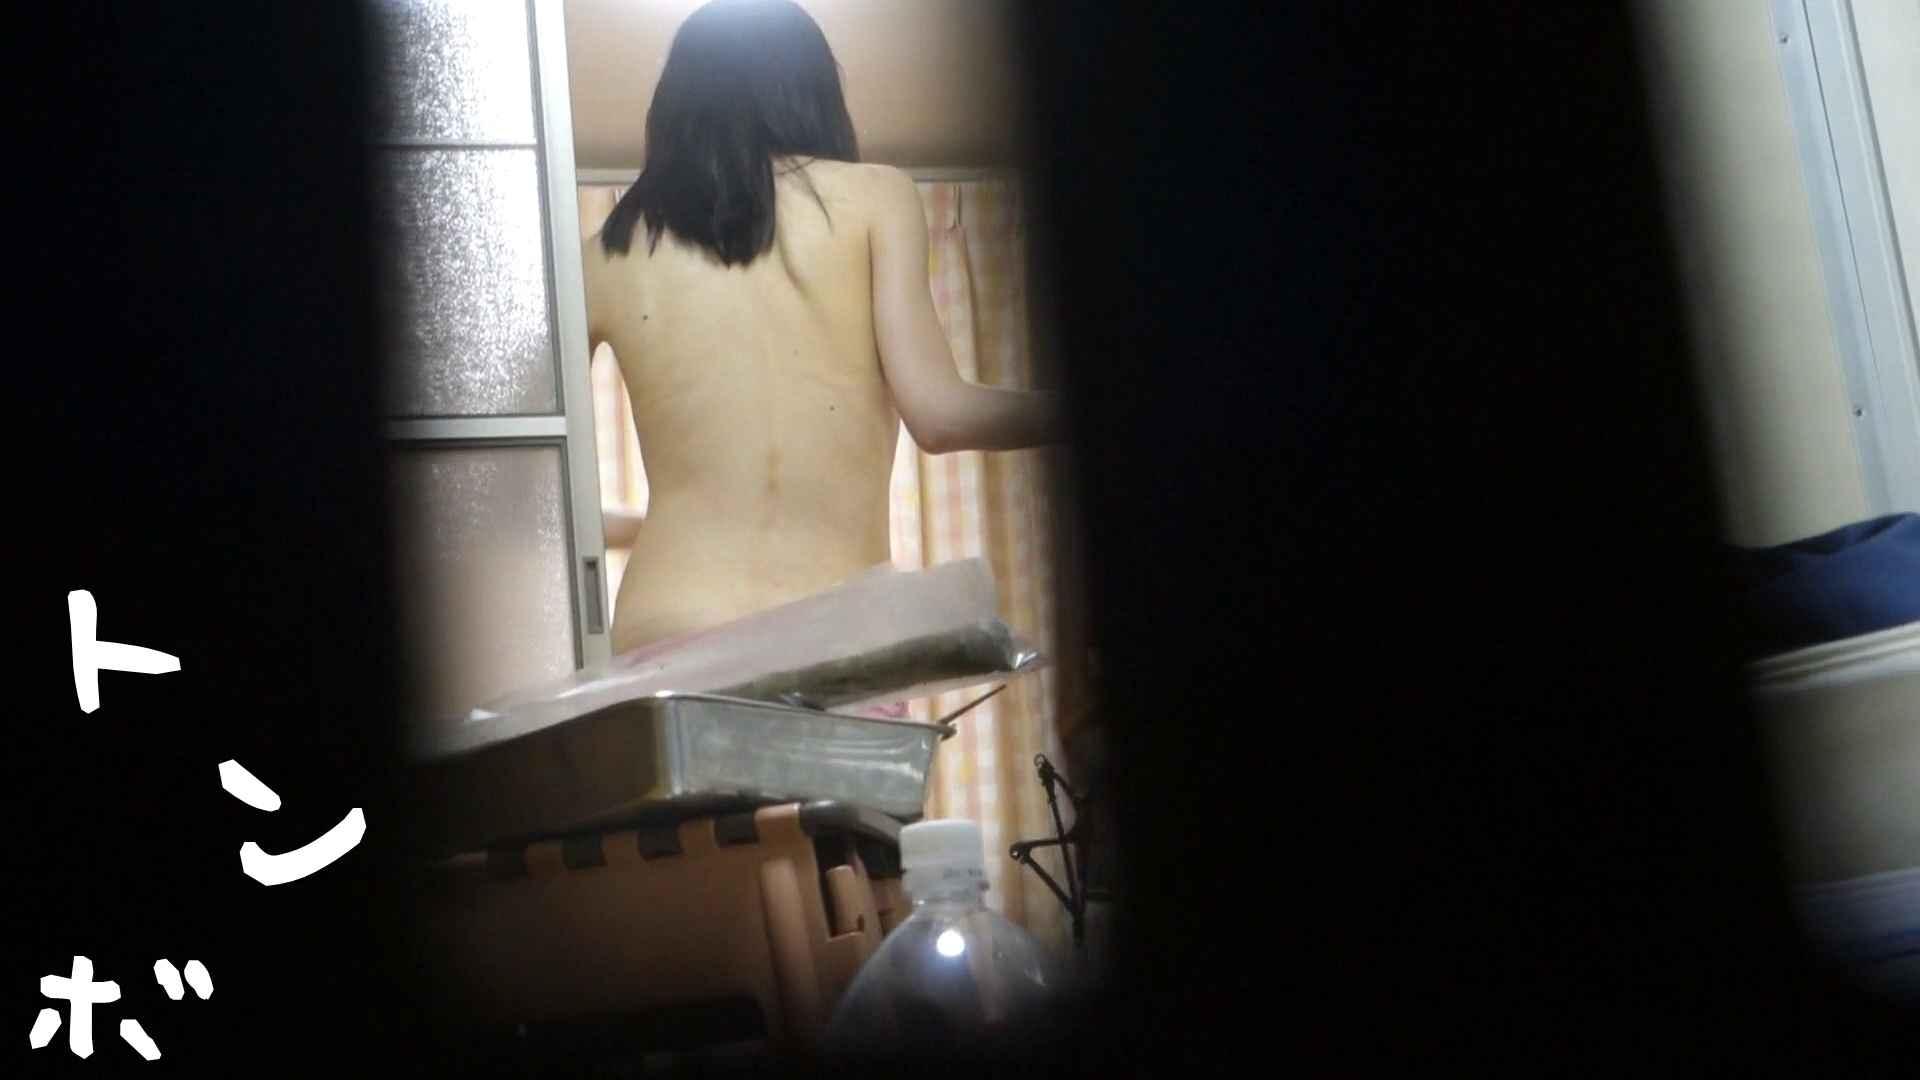 リアル盗撮 現役女子大生の私生活③ 細身  104PIX 53